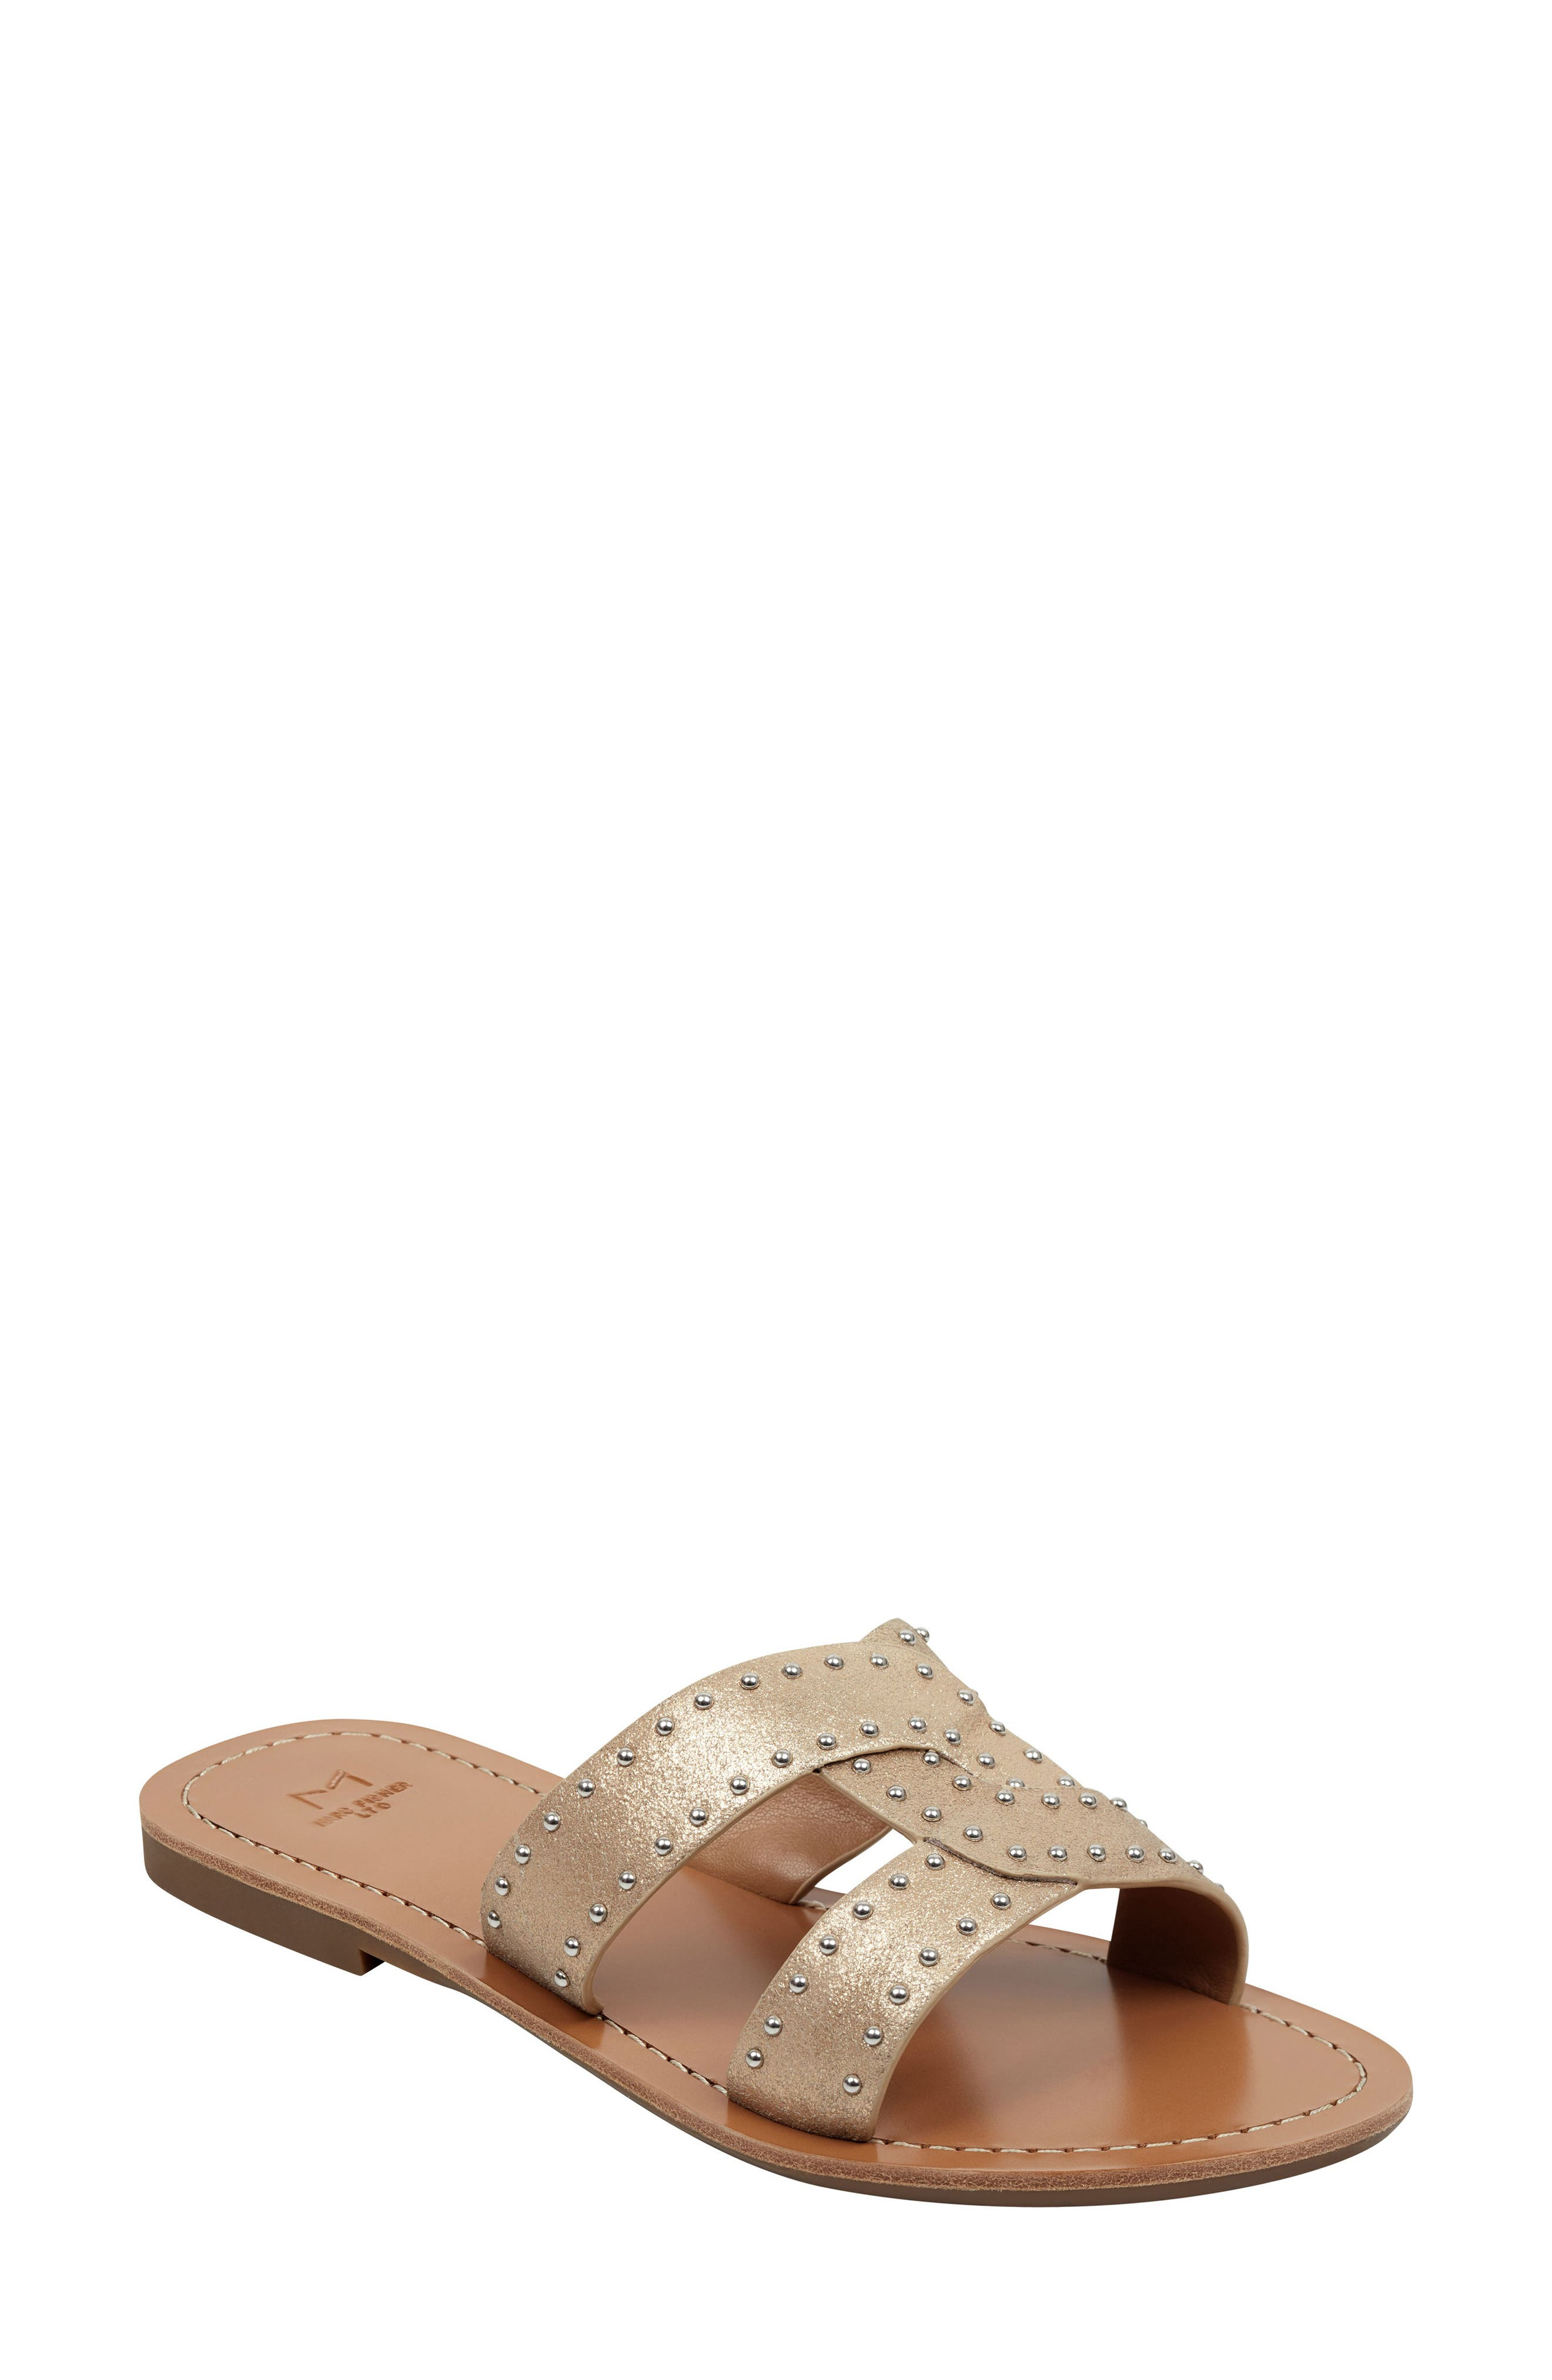 Marc Fisher Ltd Ramie Slide Sandal, Metallic